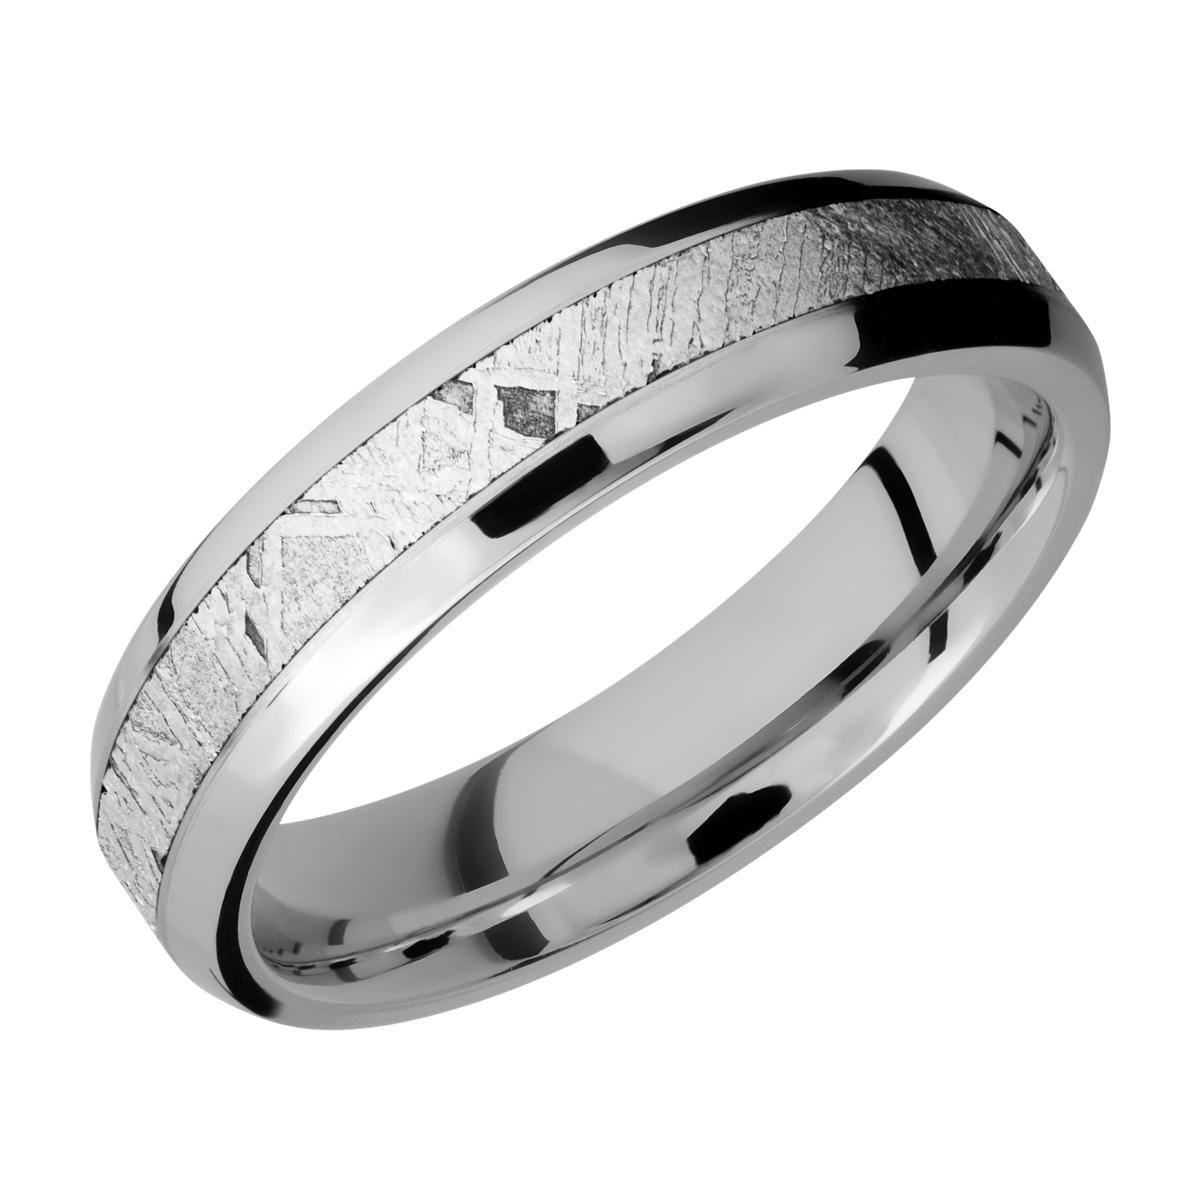 Lashbrook Cc5b13 Ns Meteorite Cobalt Chrome Wedding Ring Or Band